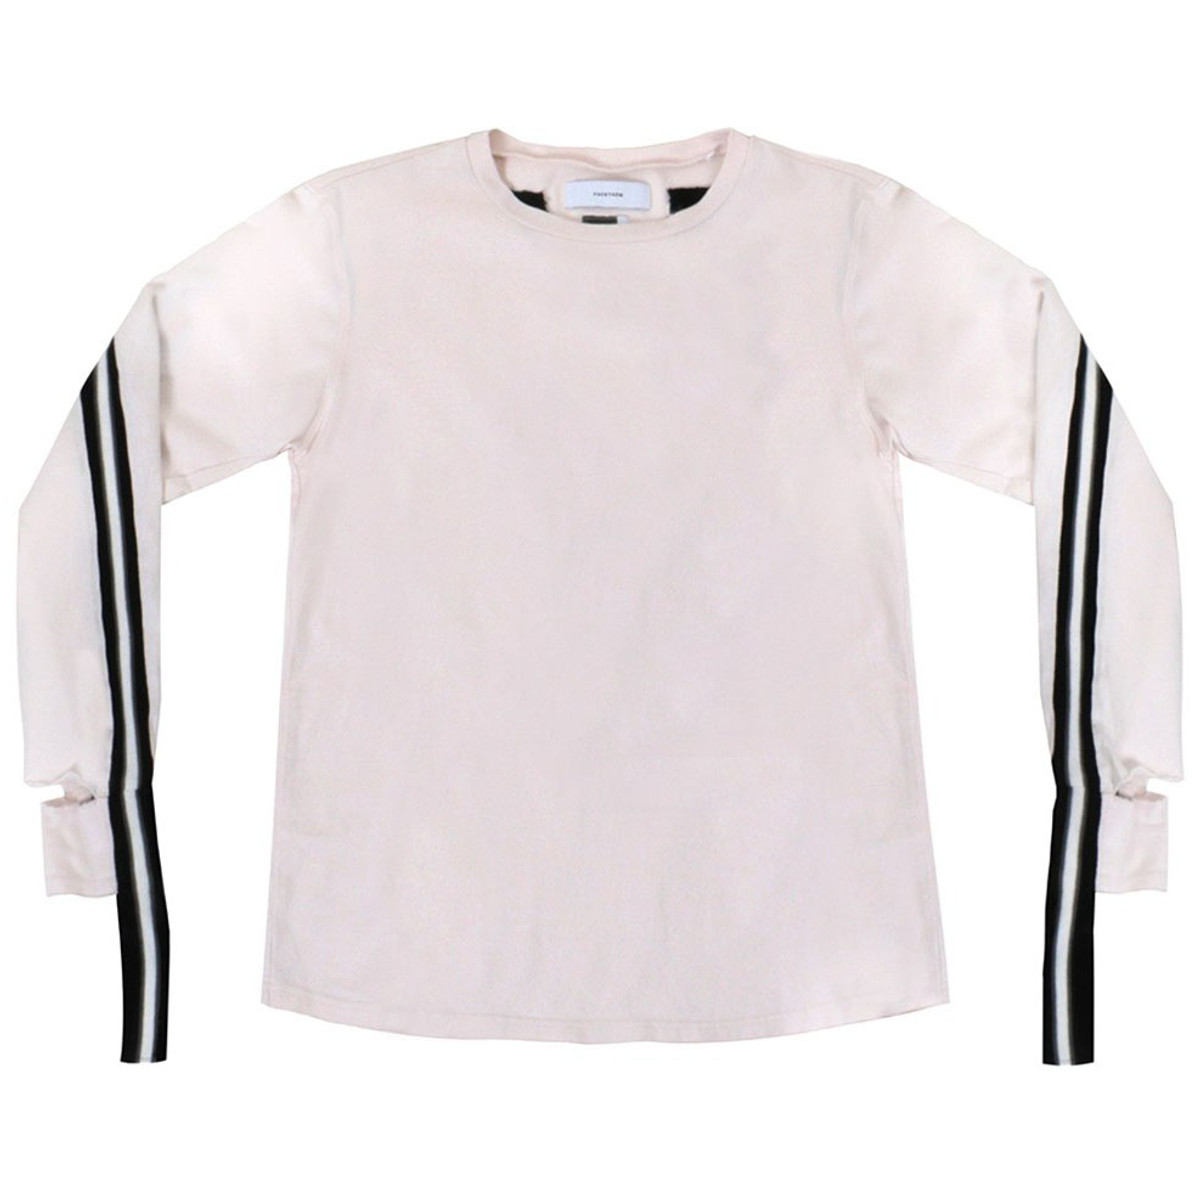 c8d407897 Pink Brand Long Sleeve Shirts